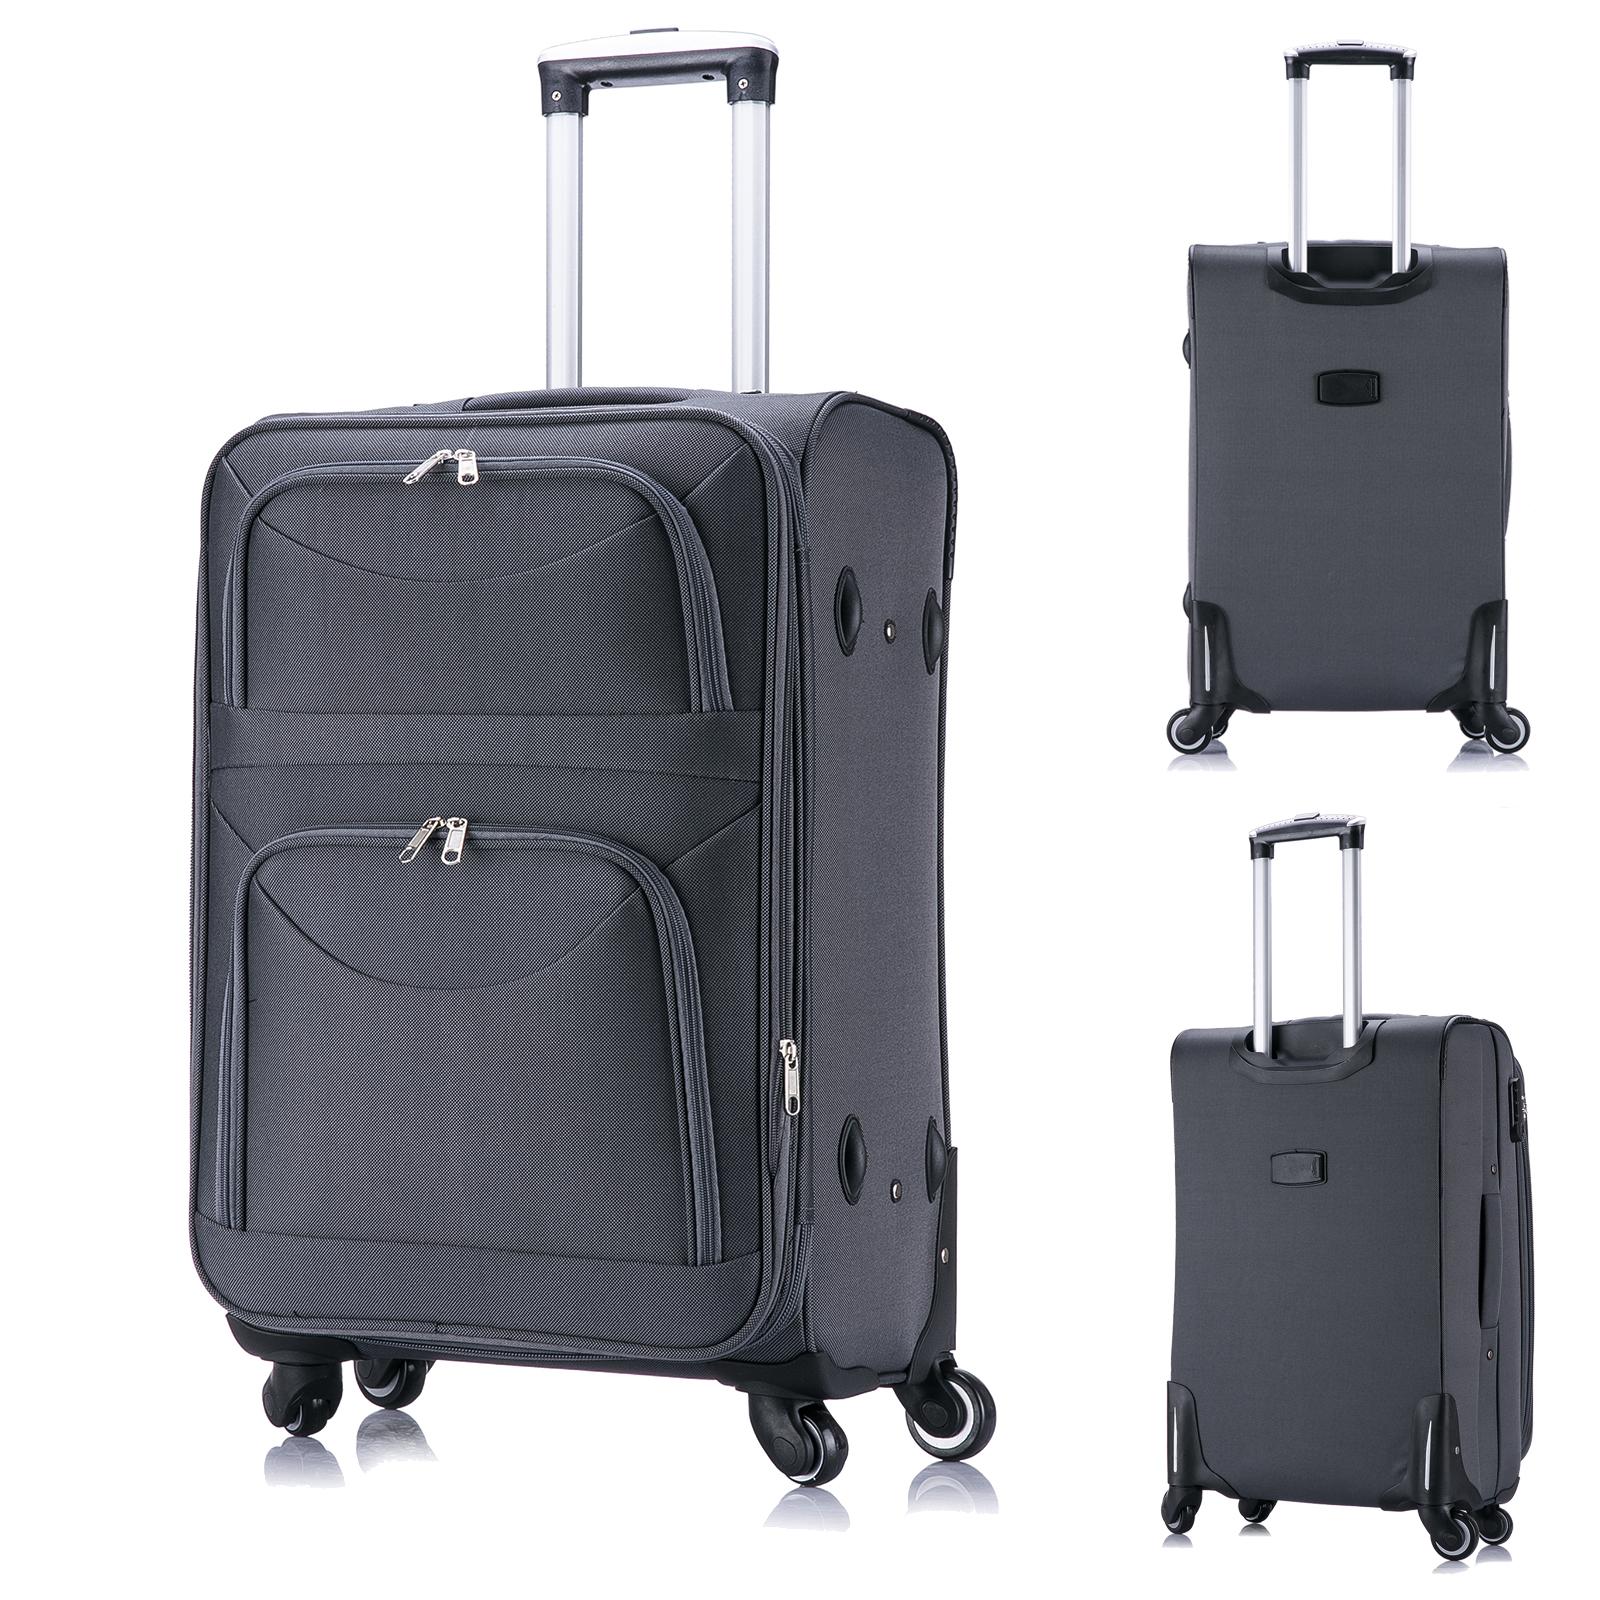 valise de voyage bagage en tissu avec 4 roues taille m xl f150 ebay. Black Bedroom Furniture Sets. Home Design Ideas